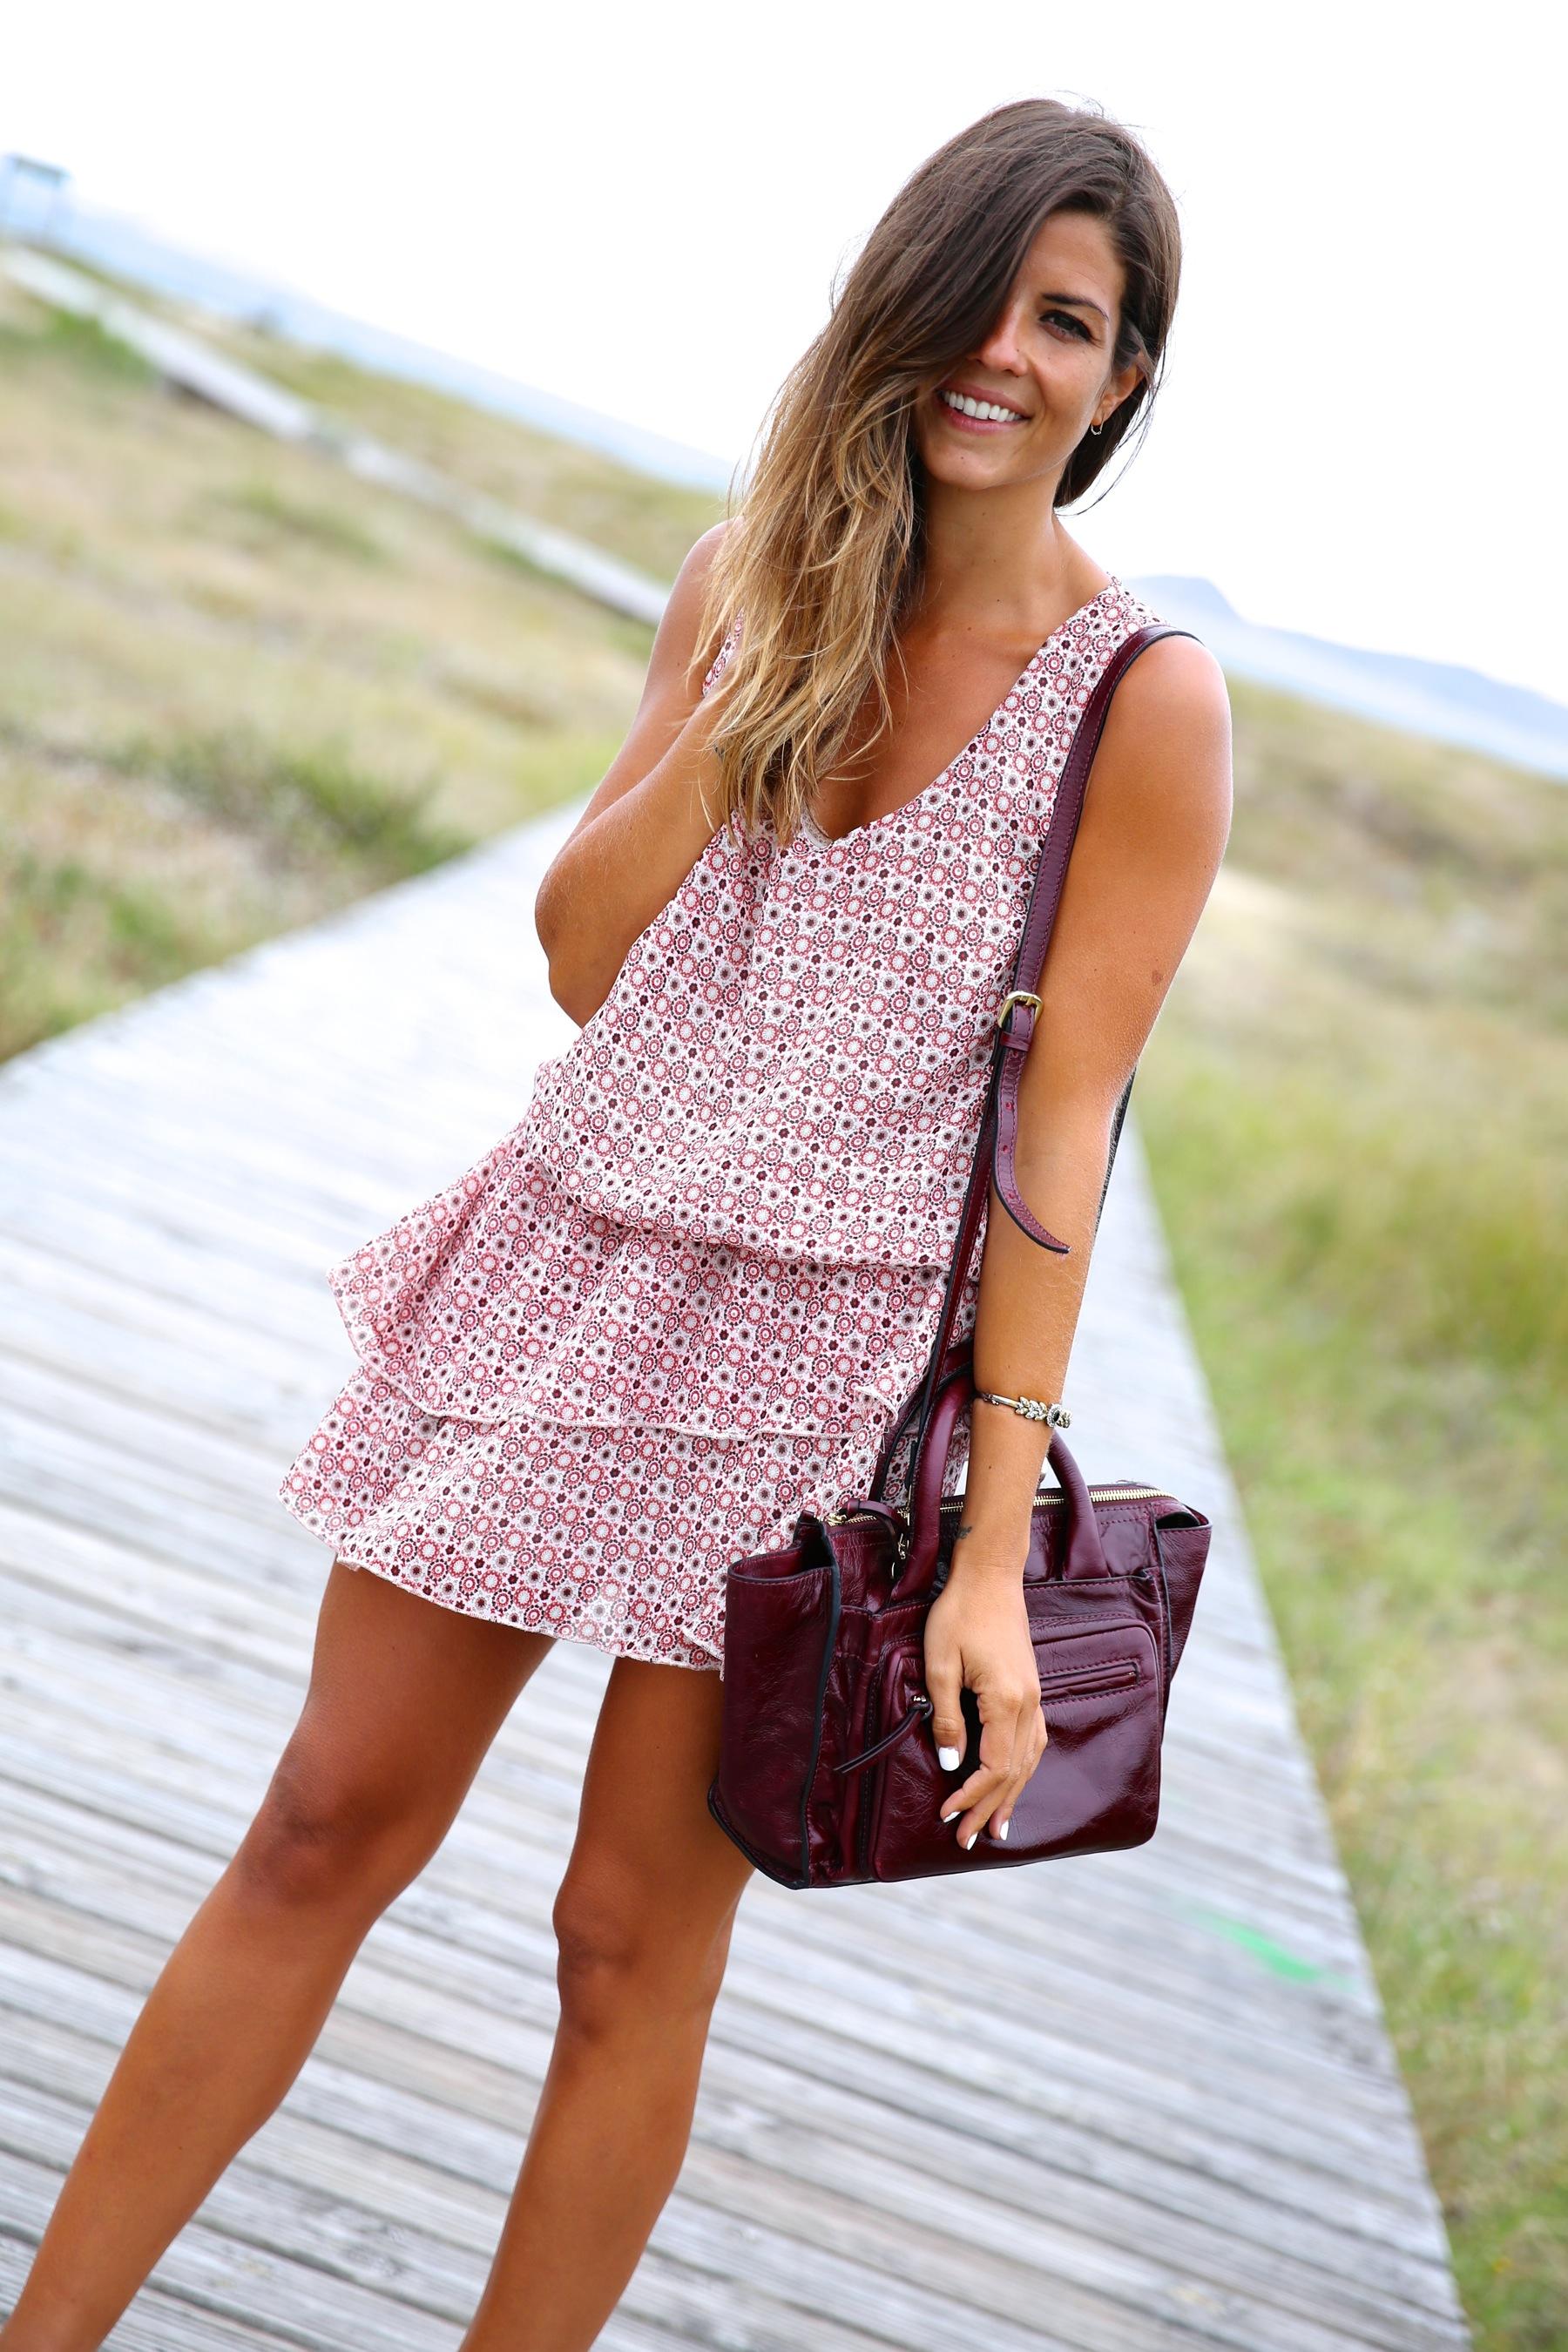 trendy_taste-look-outfit-street_style-ootd-blog-blogger-fashion_spain-moda_españa-boho-beach-playa-galicia-vestido-dress-sandalias-sandals-7